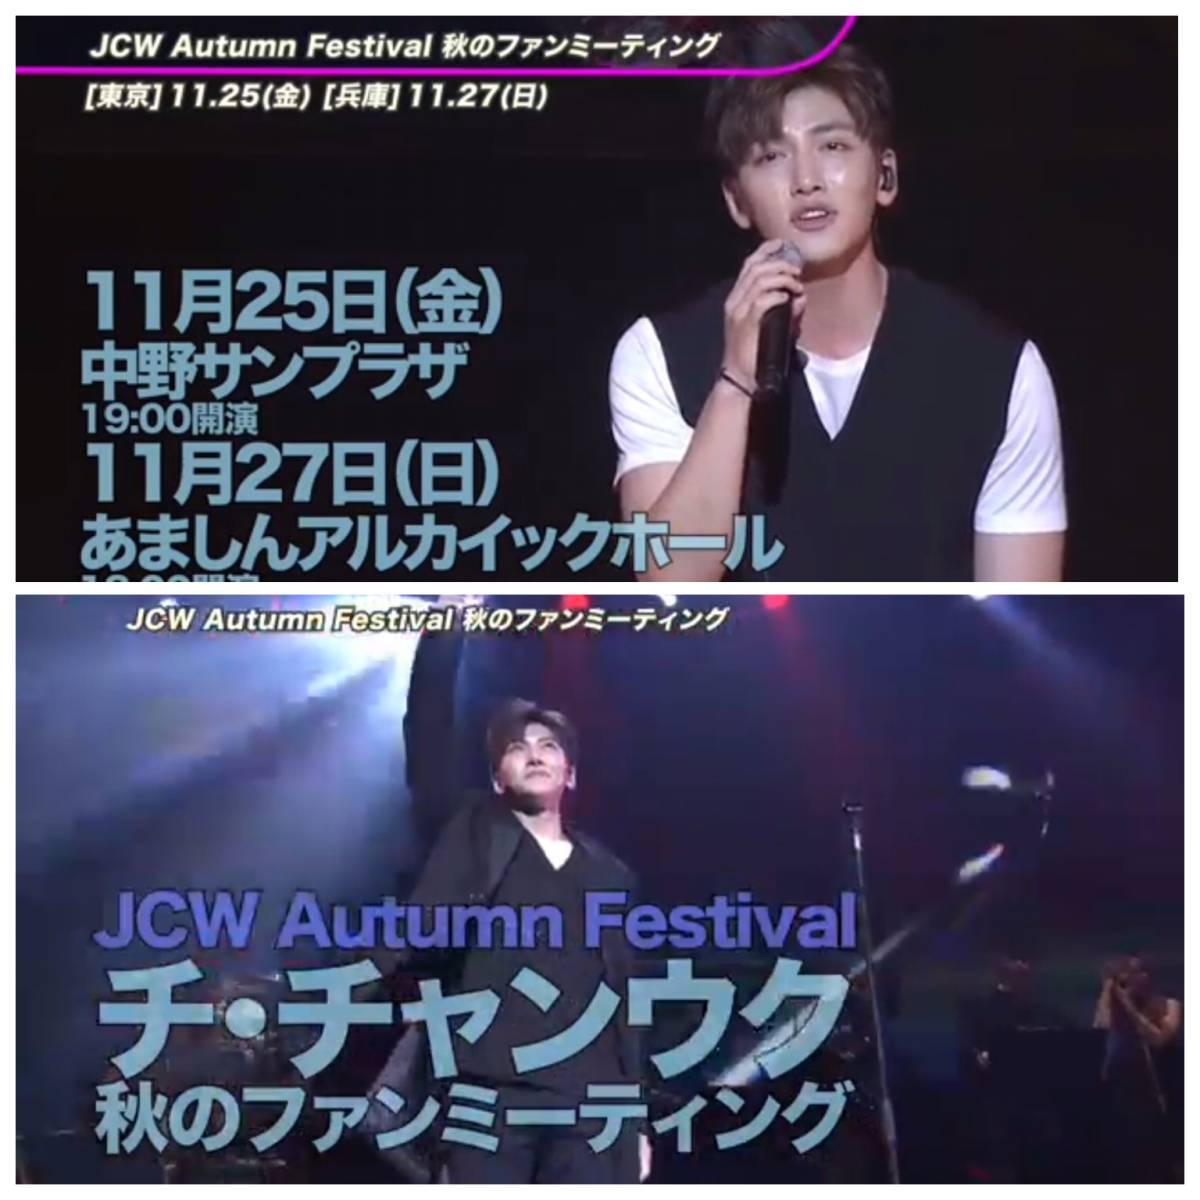 JCW Autuumn Festival チ・チャンウク 秋のファンミーティング DVD 日本語字幕